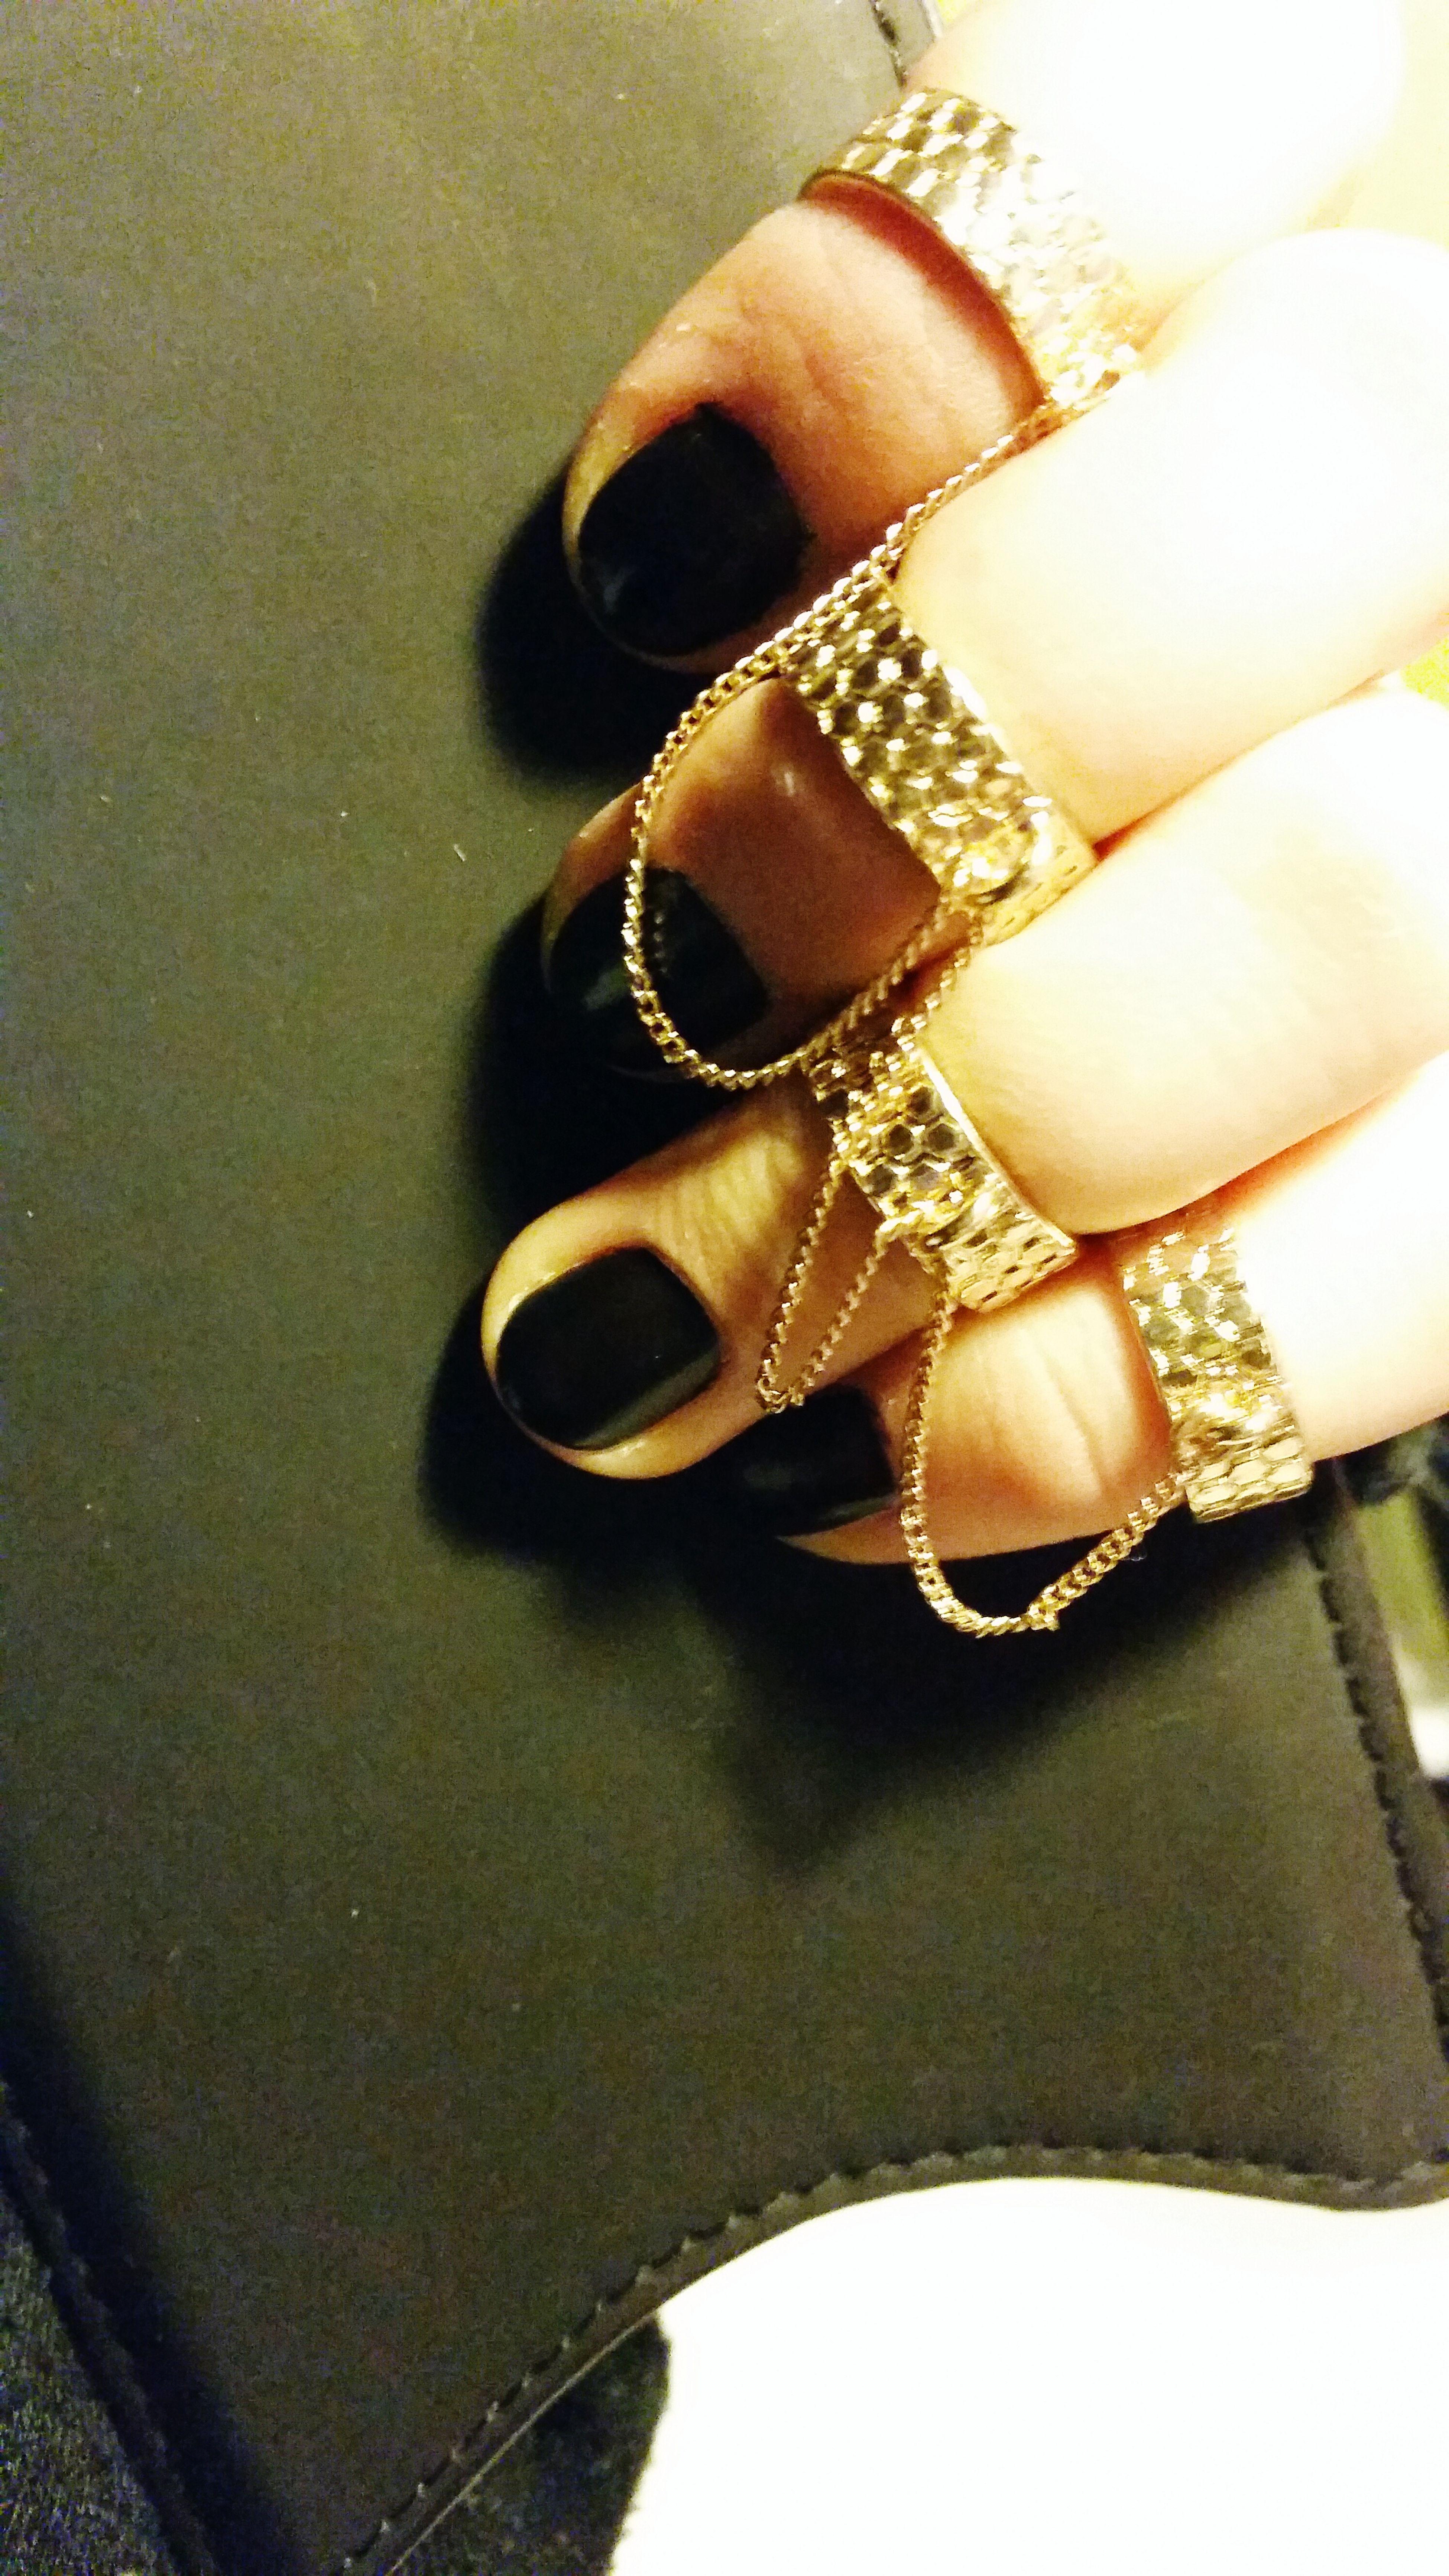 Streetfashion AllFingerRings GoldOnBlack Blacknails  Pretty